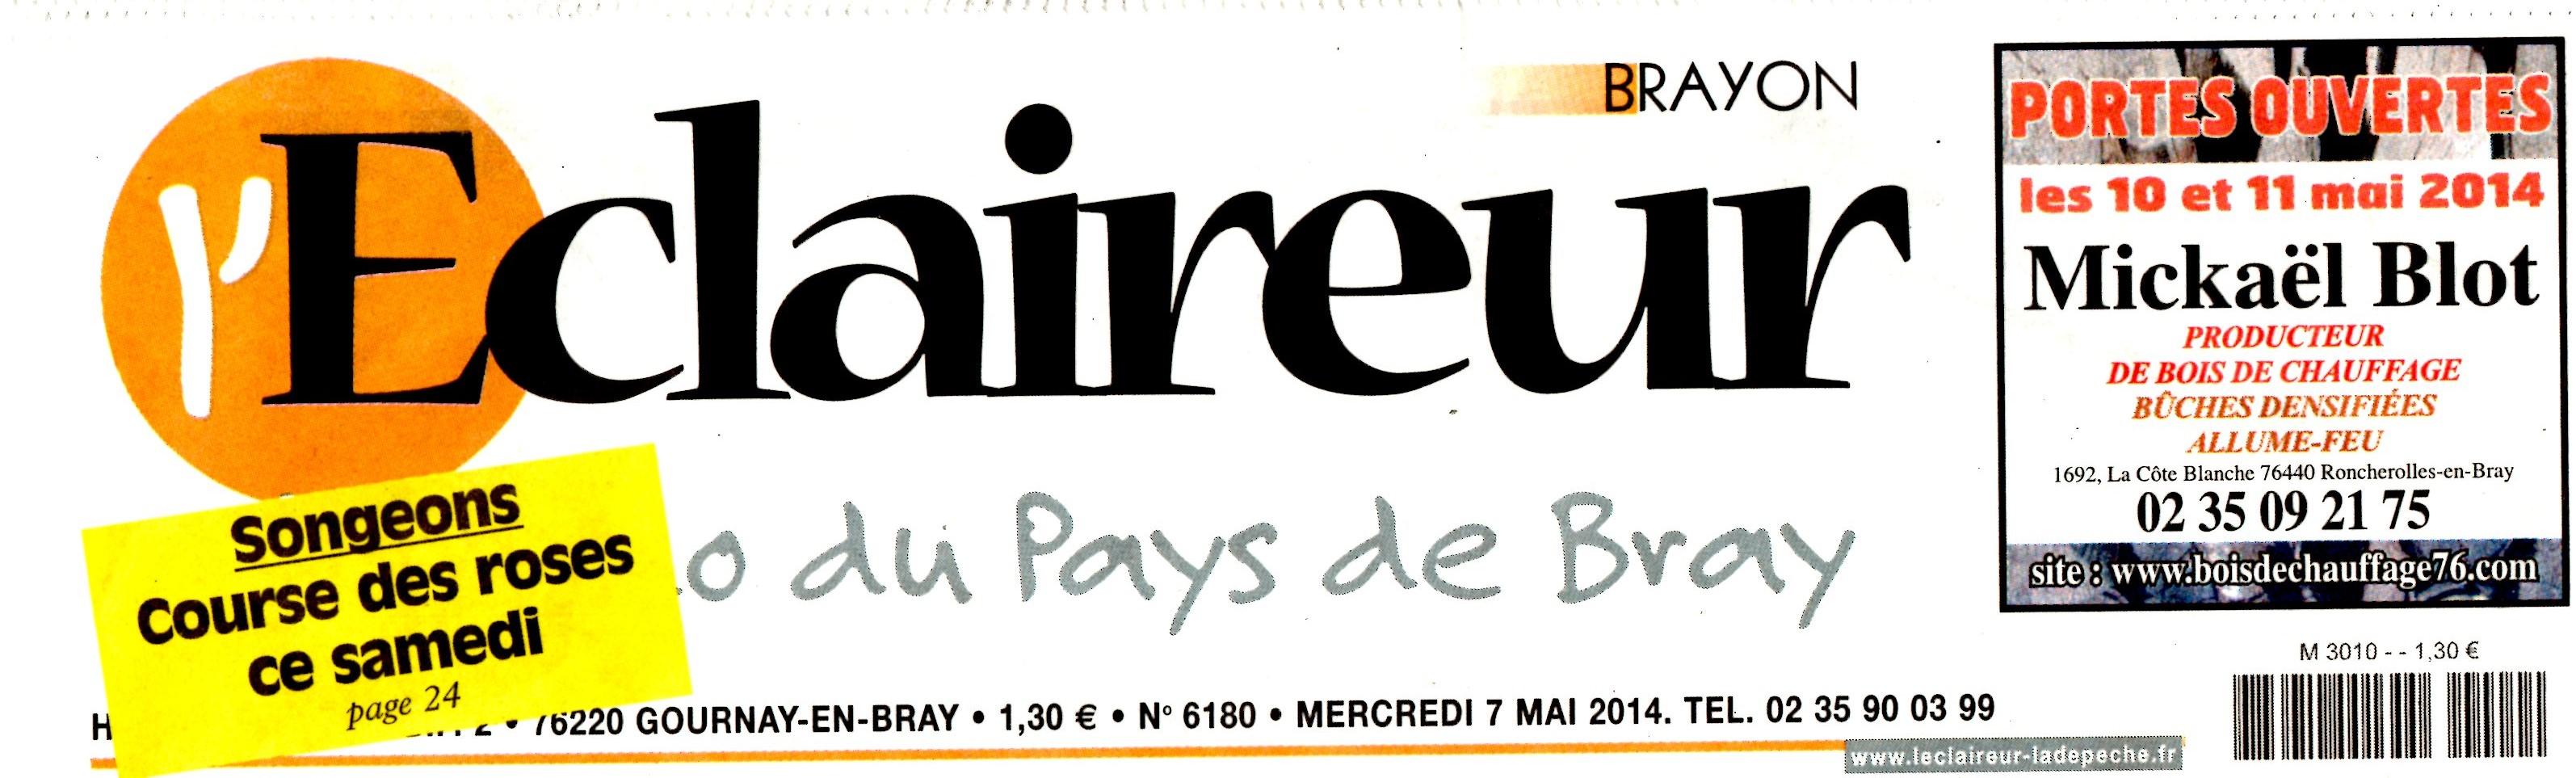 L'ECLAIREUR BRAYON  7 MAI 2014001